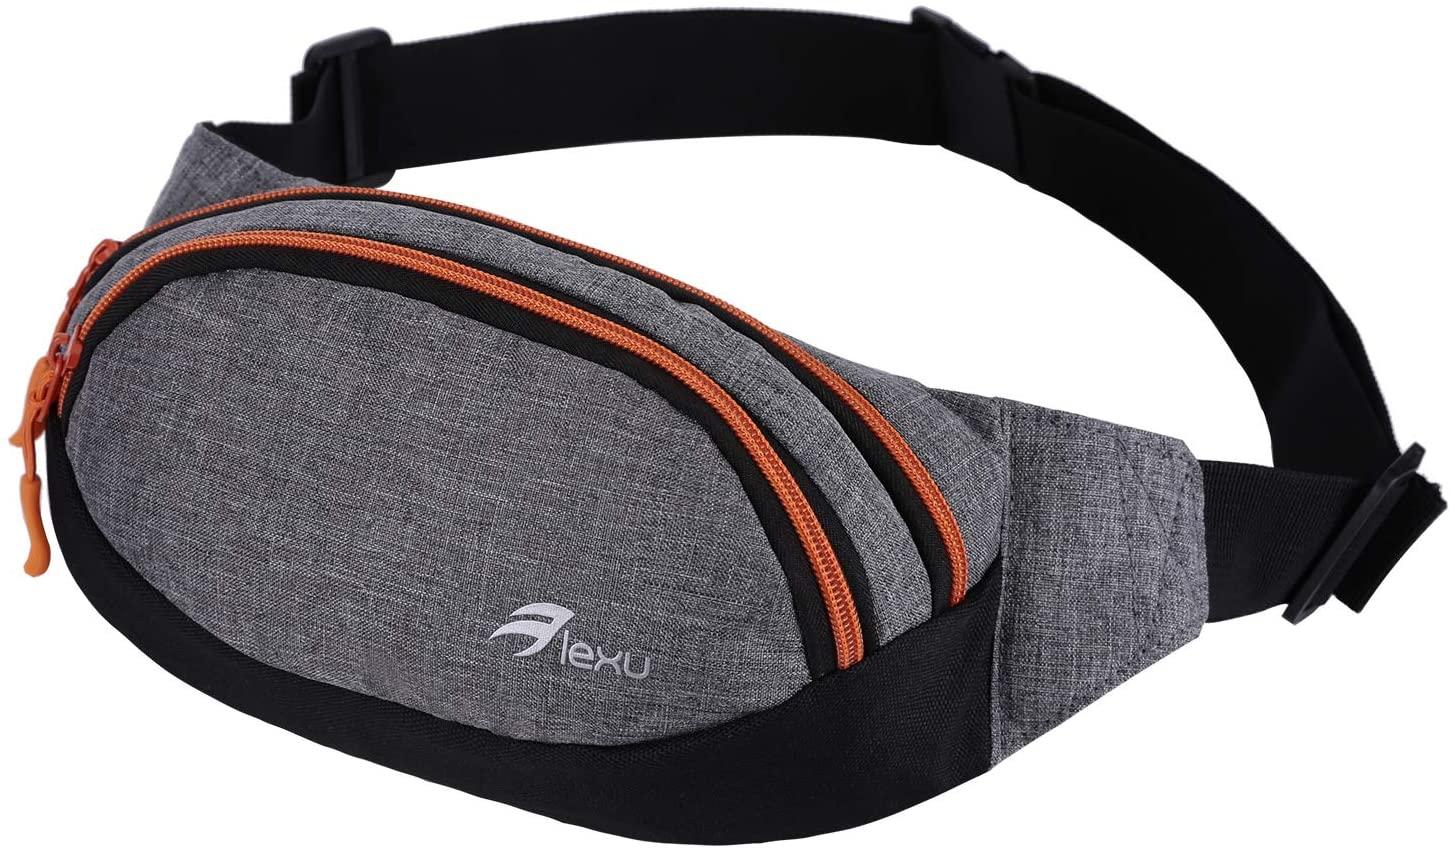 LEXU Travel Fanny Bag Slim Soft Polyester Waist Pack Resistant Tool Pocket Cashier's box For Man Women (Grey Orange)